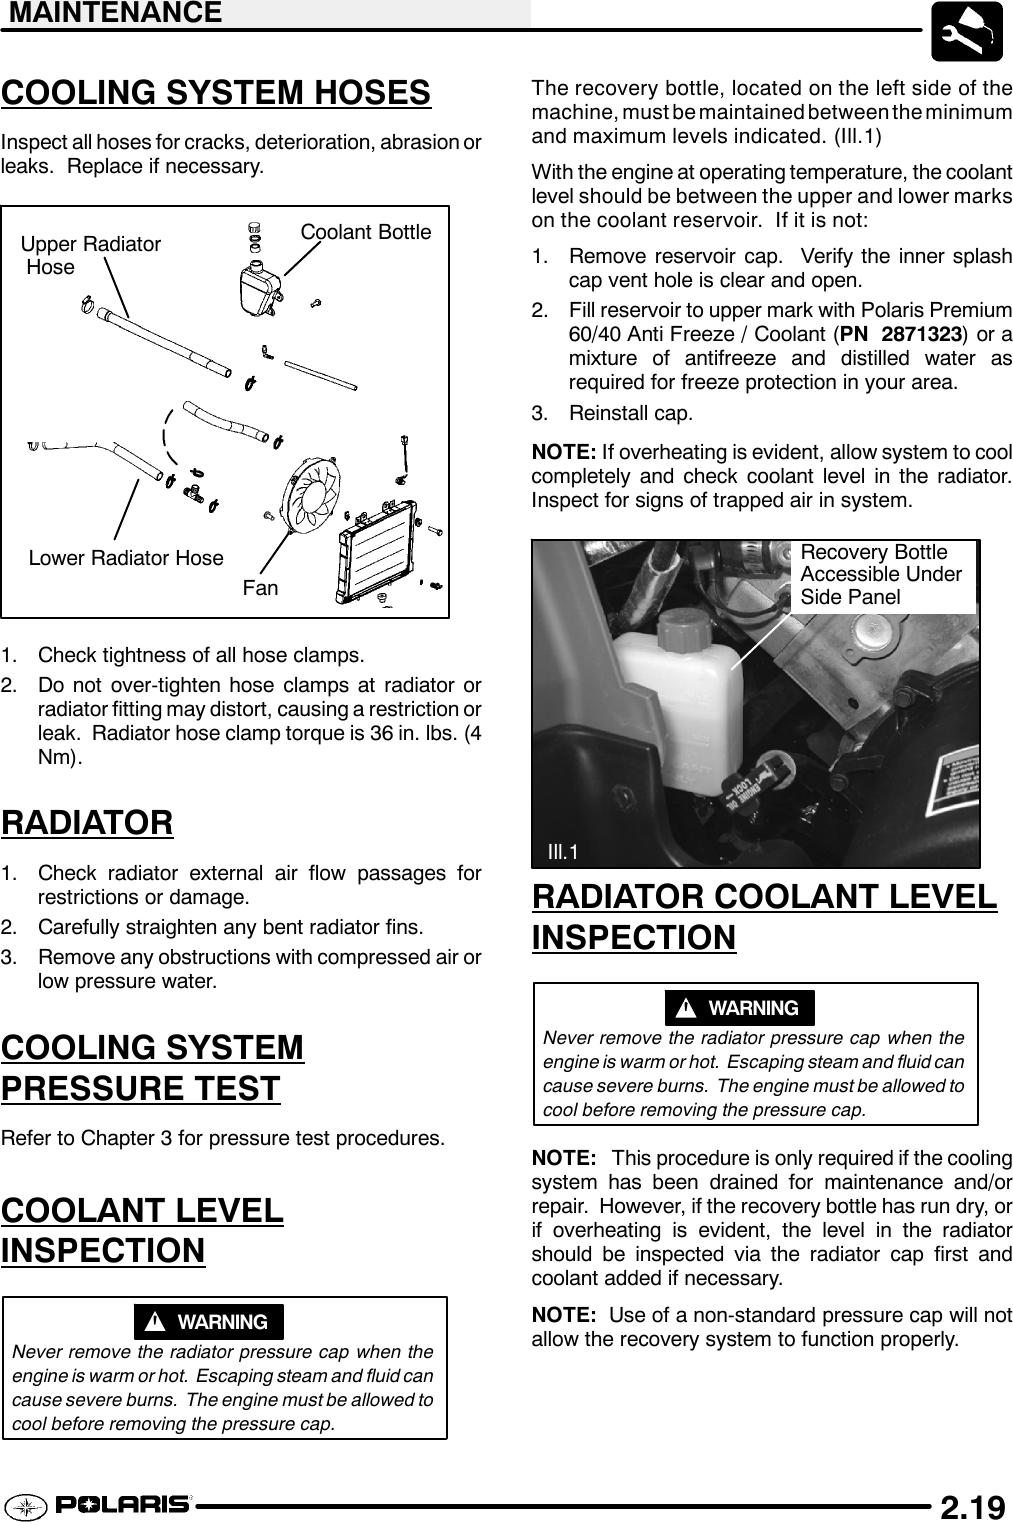 2004 polaris sportsman 700 ignition wiring diagram 2005 polaris sportsman 700 efi   800 service manual  2005 polaris sportsman 700 efi   800